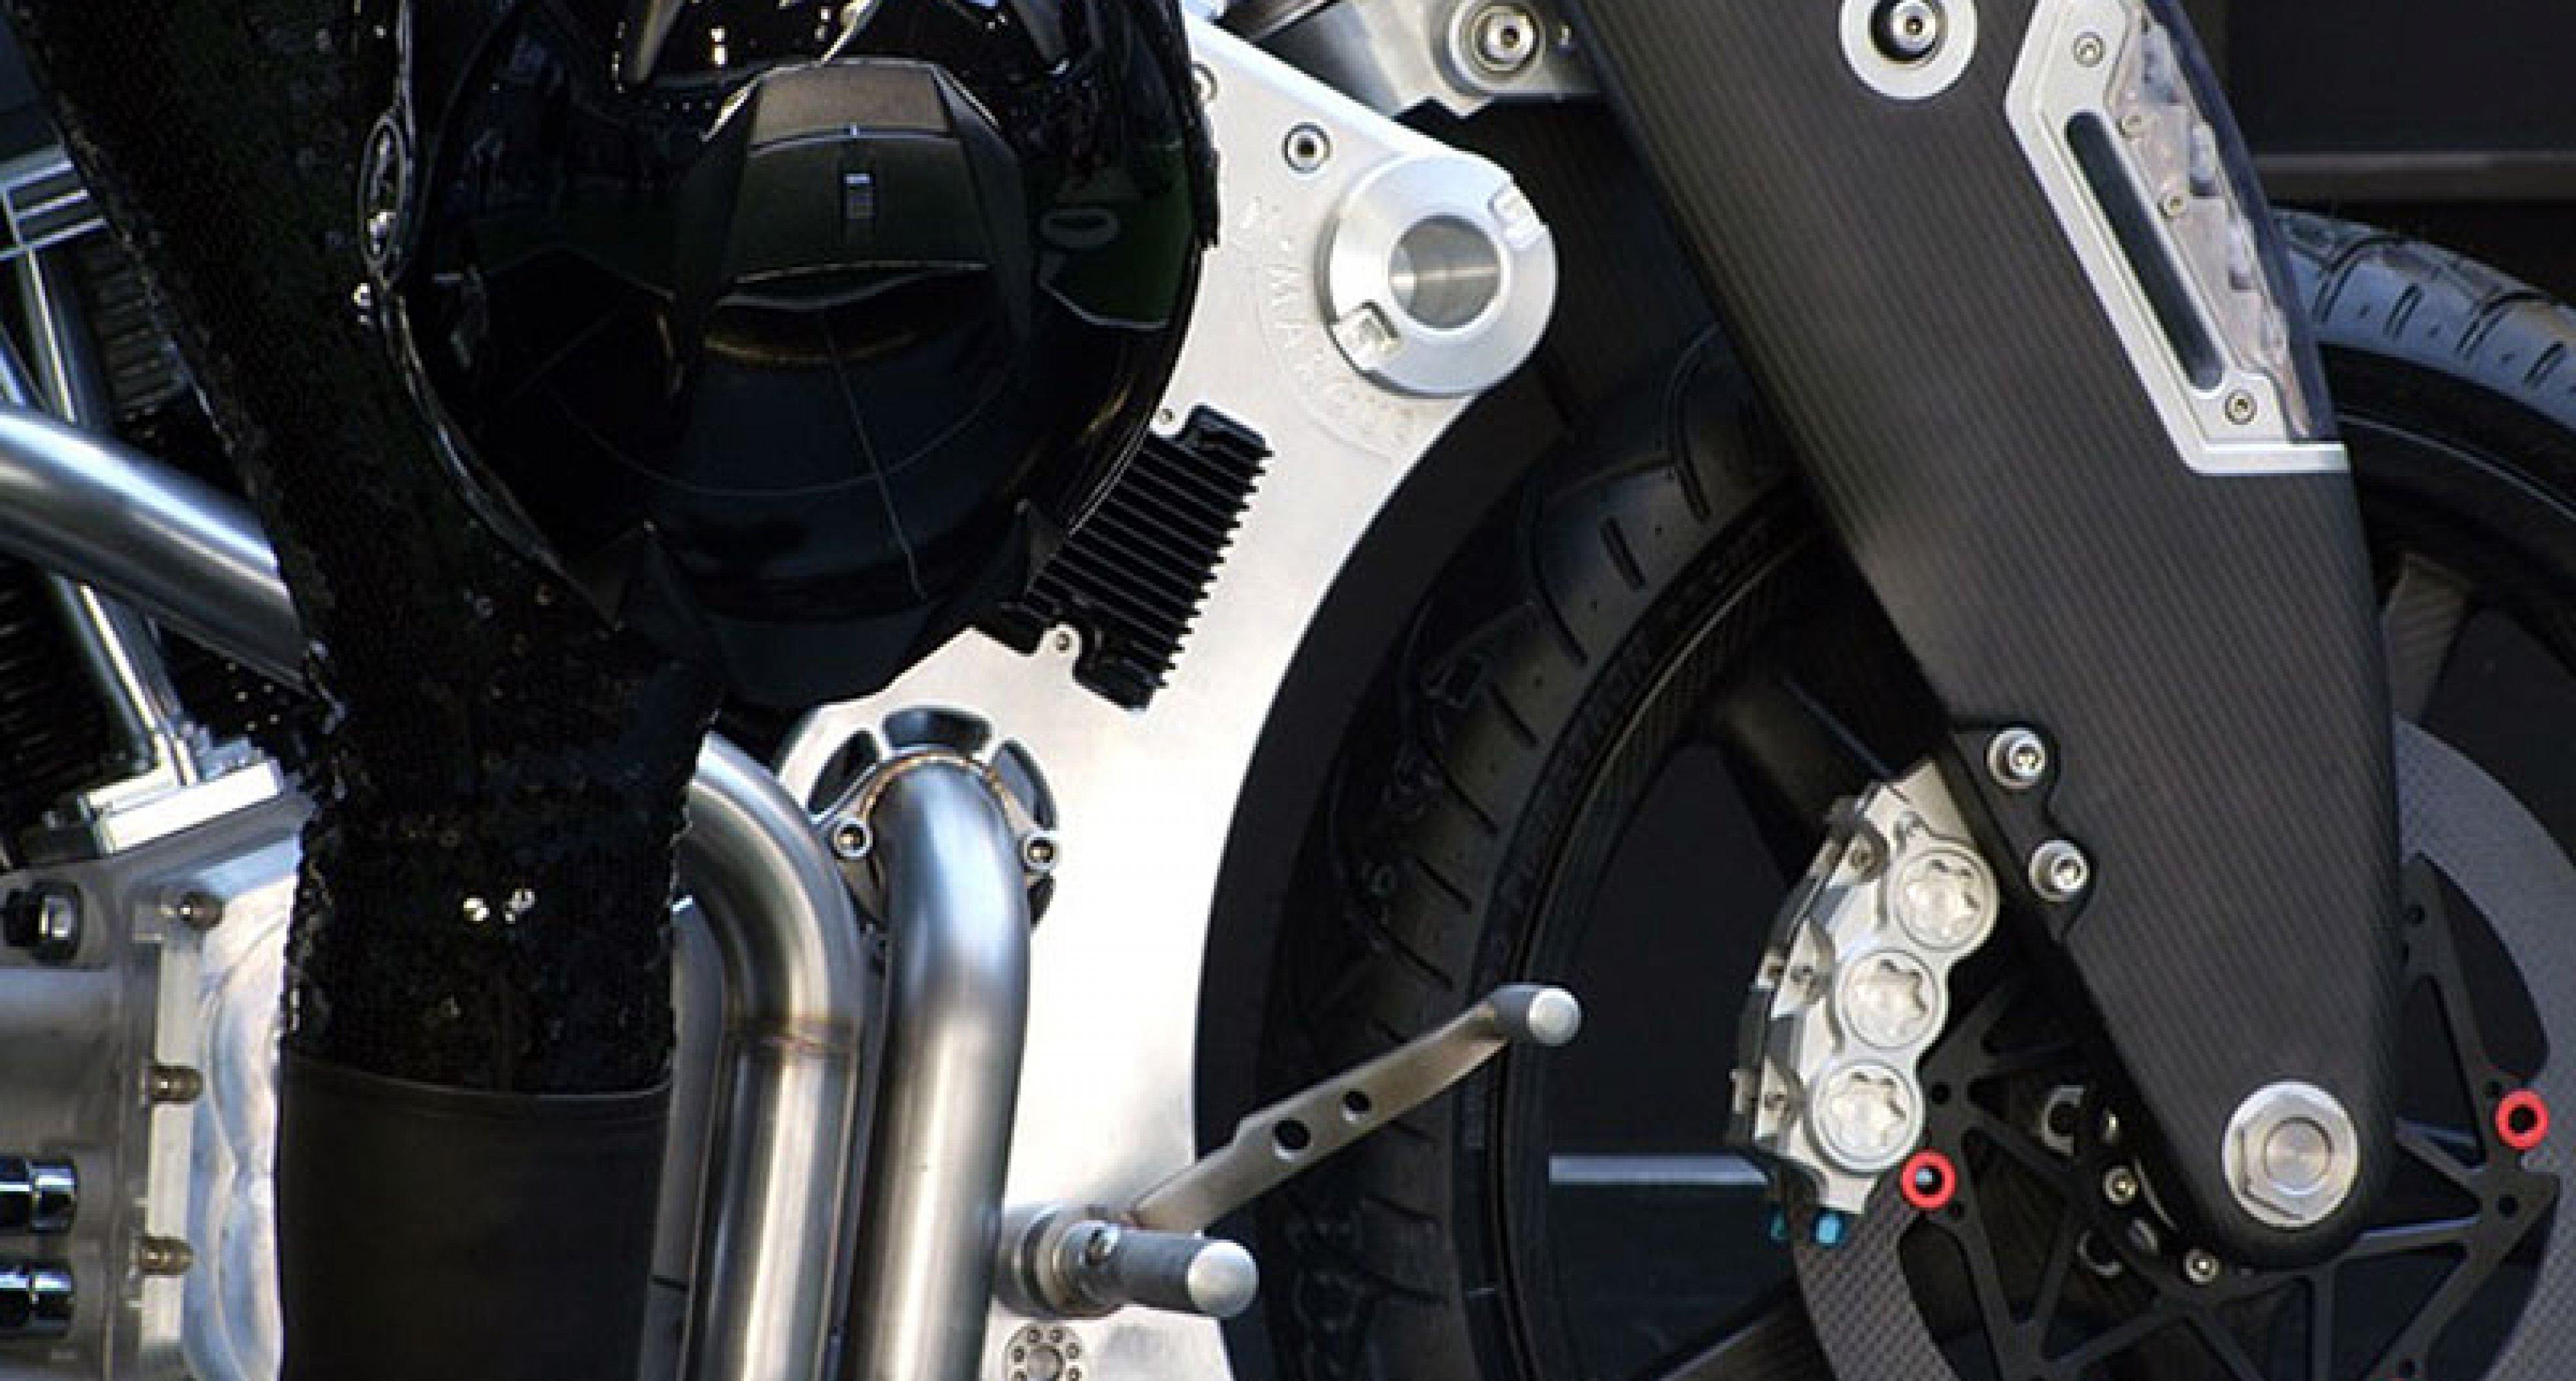 C120 Renaissance Fighter: Südstaaten Bike